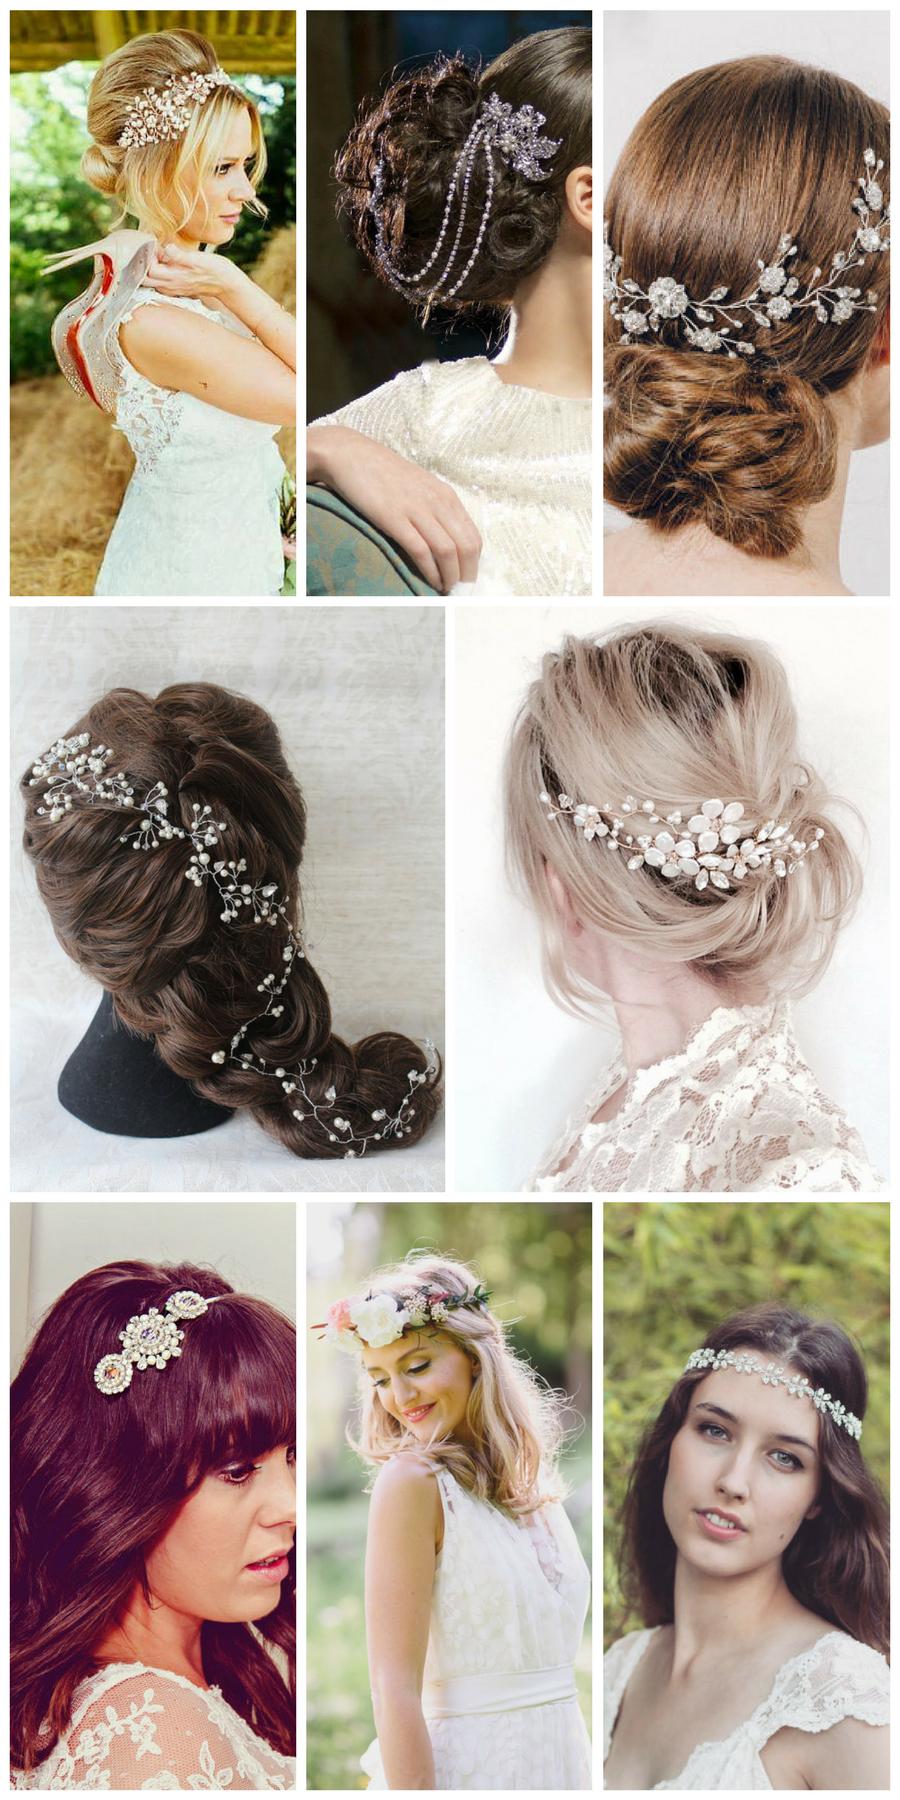 Wedding hair accessories gloucestershire - Wedding Hair Accessories Gloucestershire 25